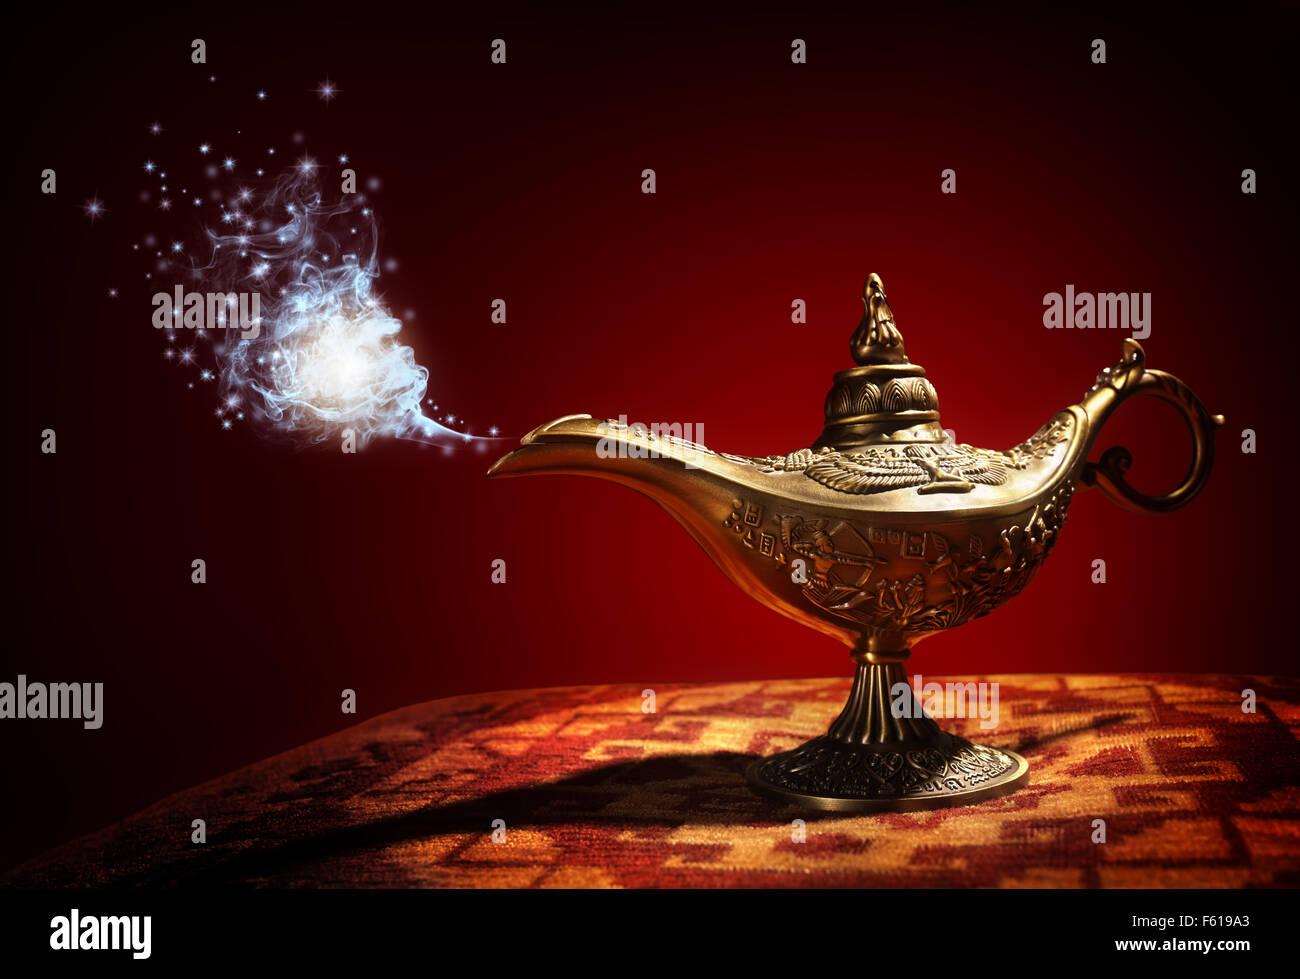 Genie lamp stock photos pictures royalty free genie - Magic Aladdins Genie Lamp